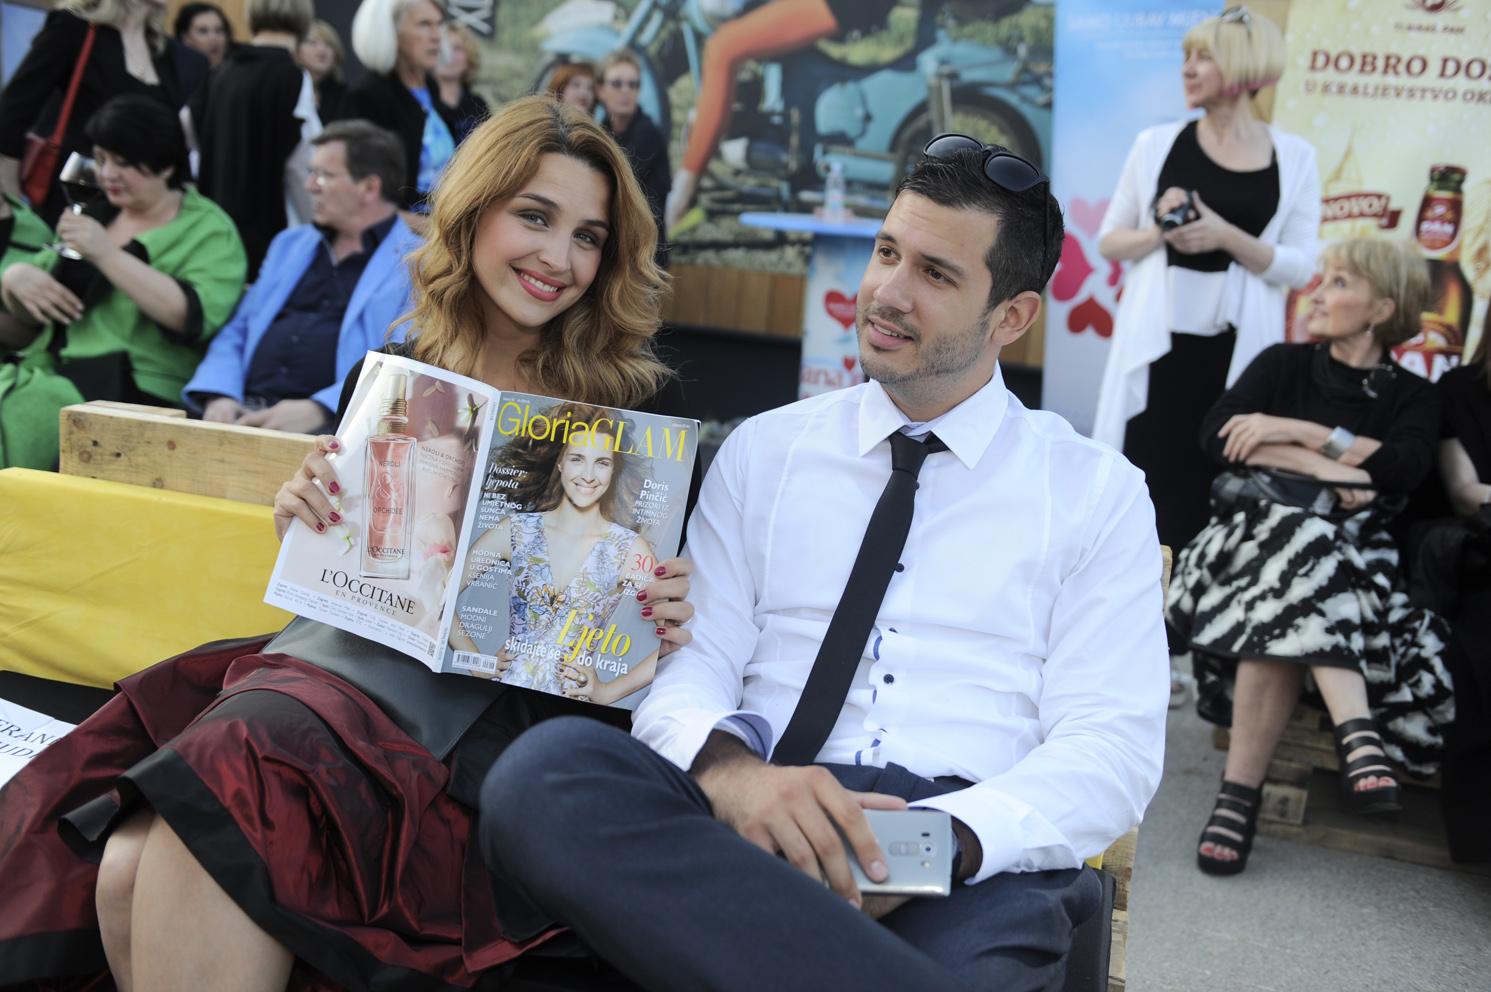 promocija Gloria Glam i 30 godina XD Xenia Design / Ksajpa Senkovec 10.06.2016. / foto: Maja Jurovic / Doris Pincic Rogoznica i Boris Rogoznica